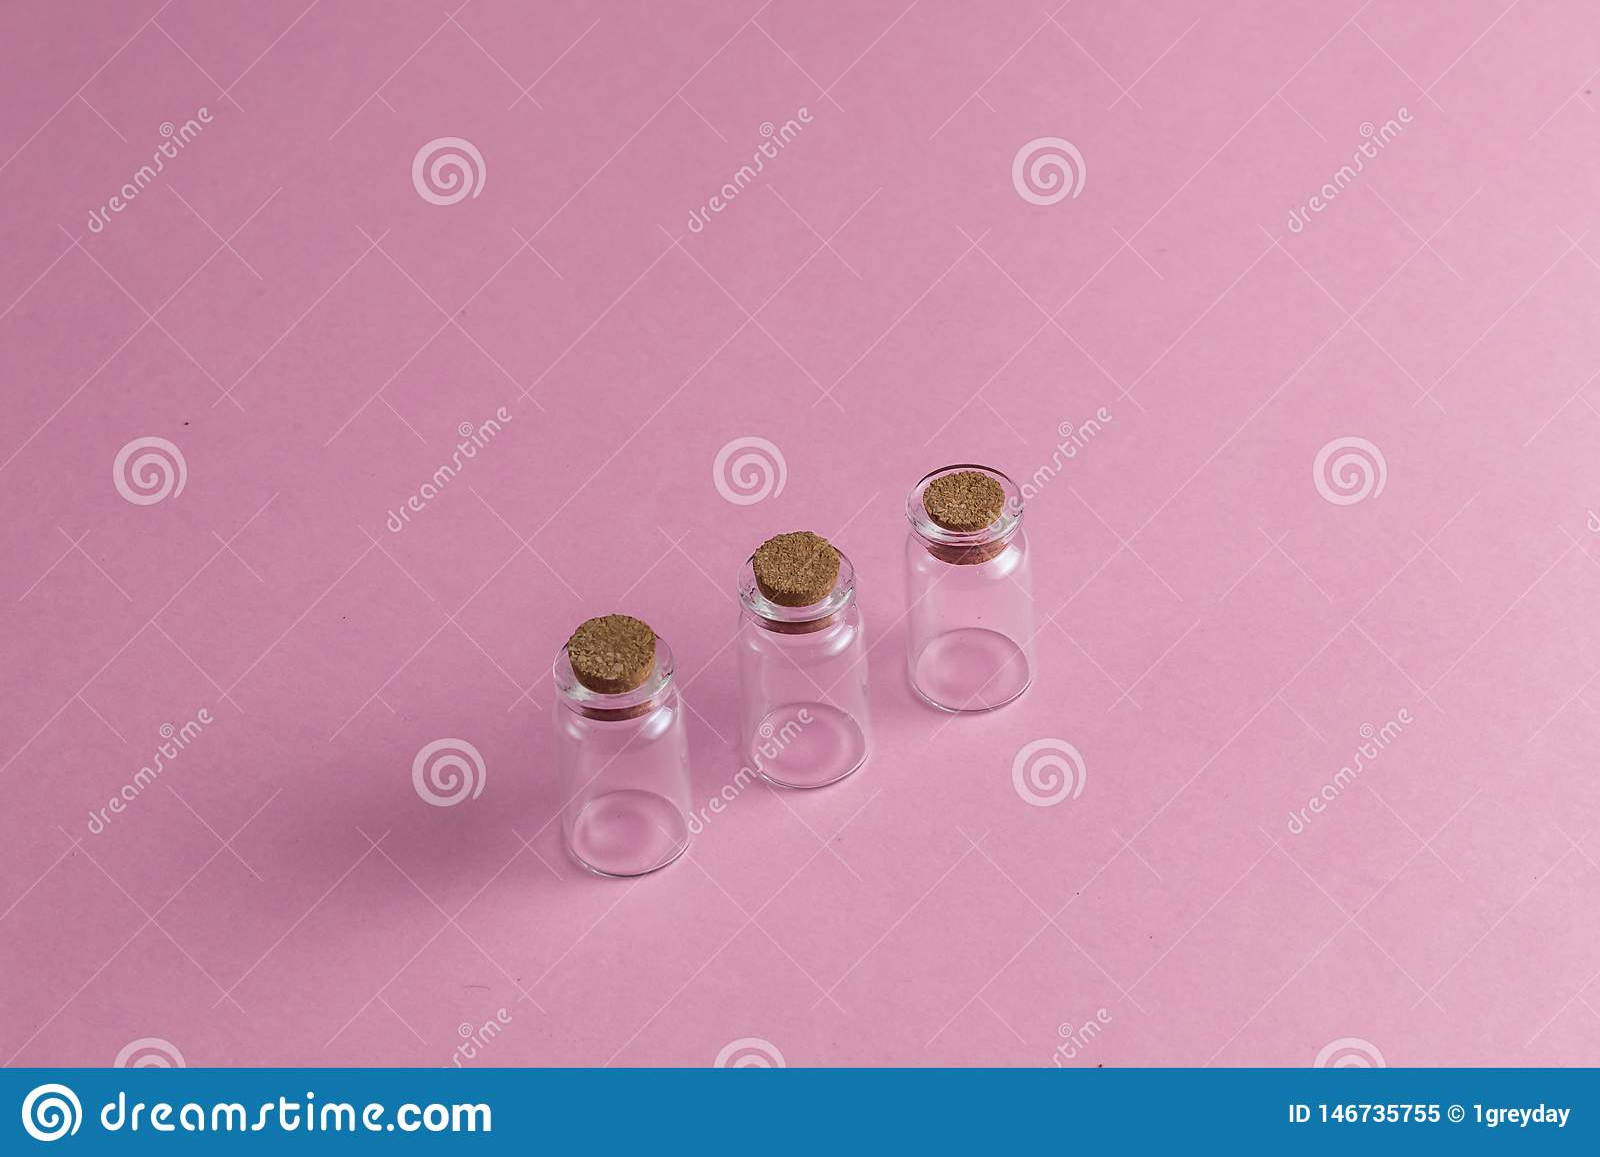 Leere Ampullen auf der rosa Tabelle